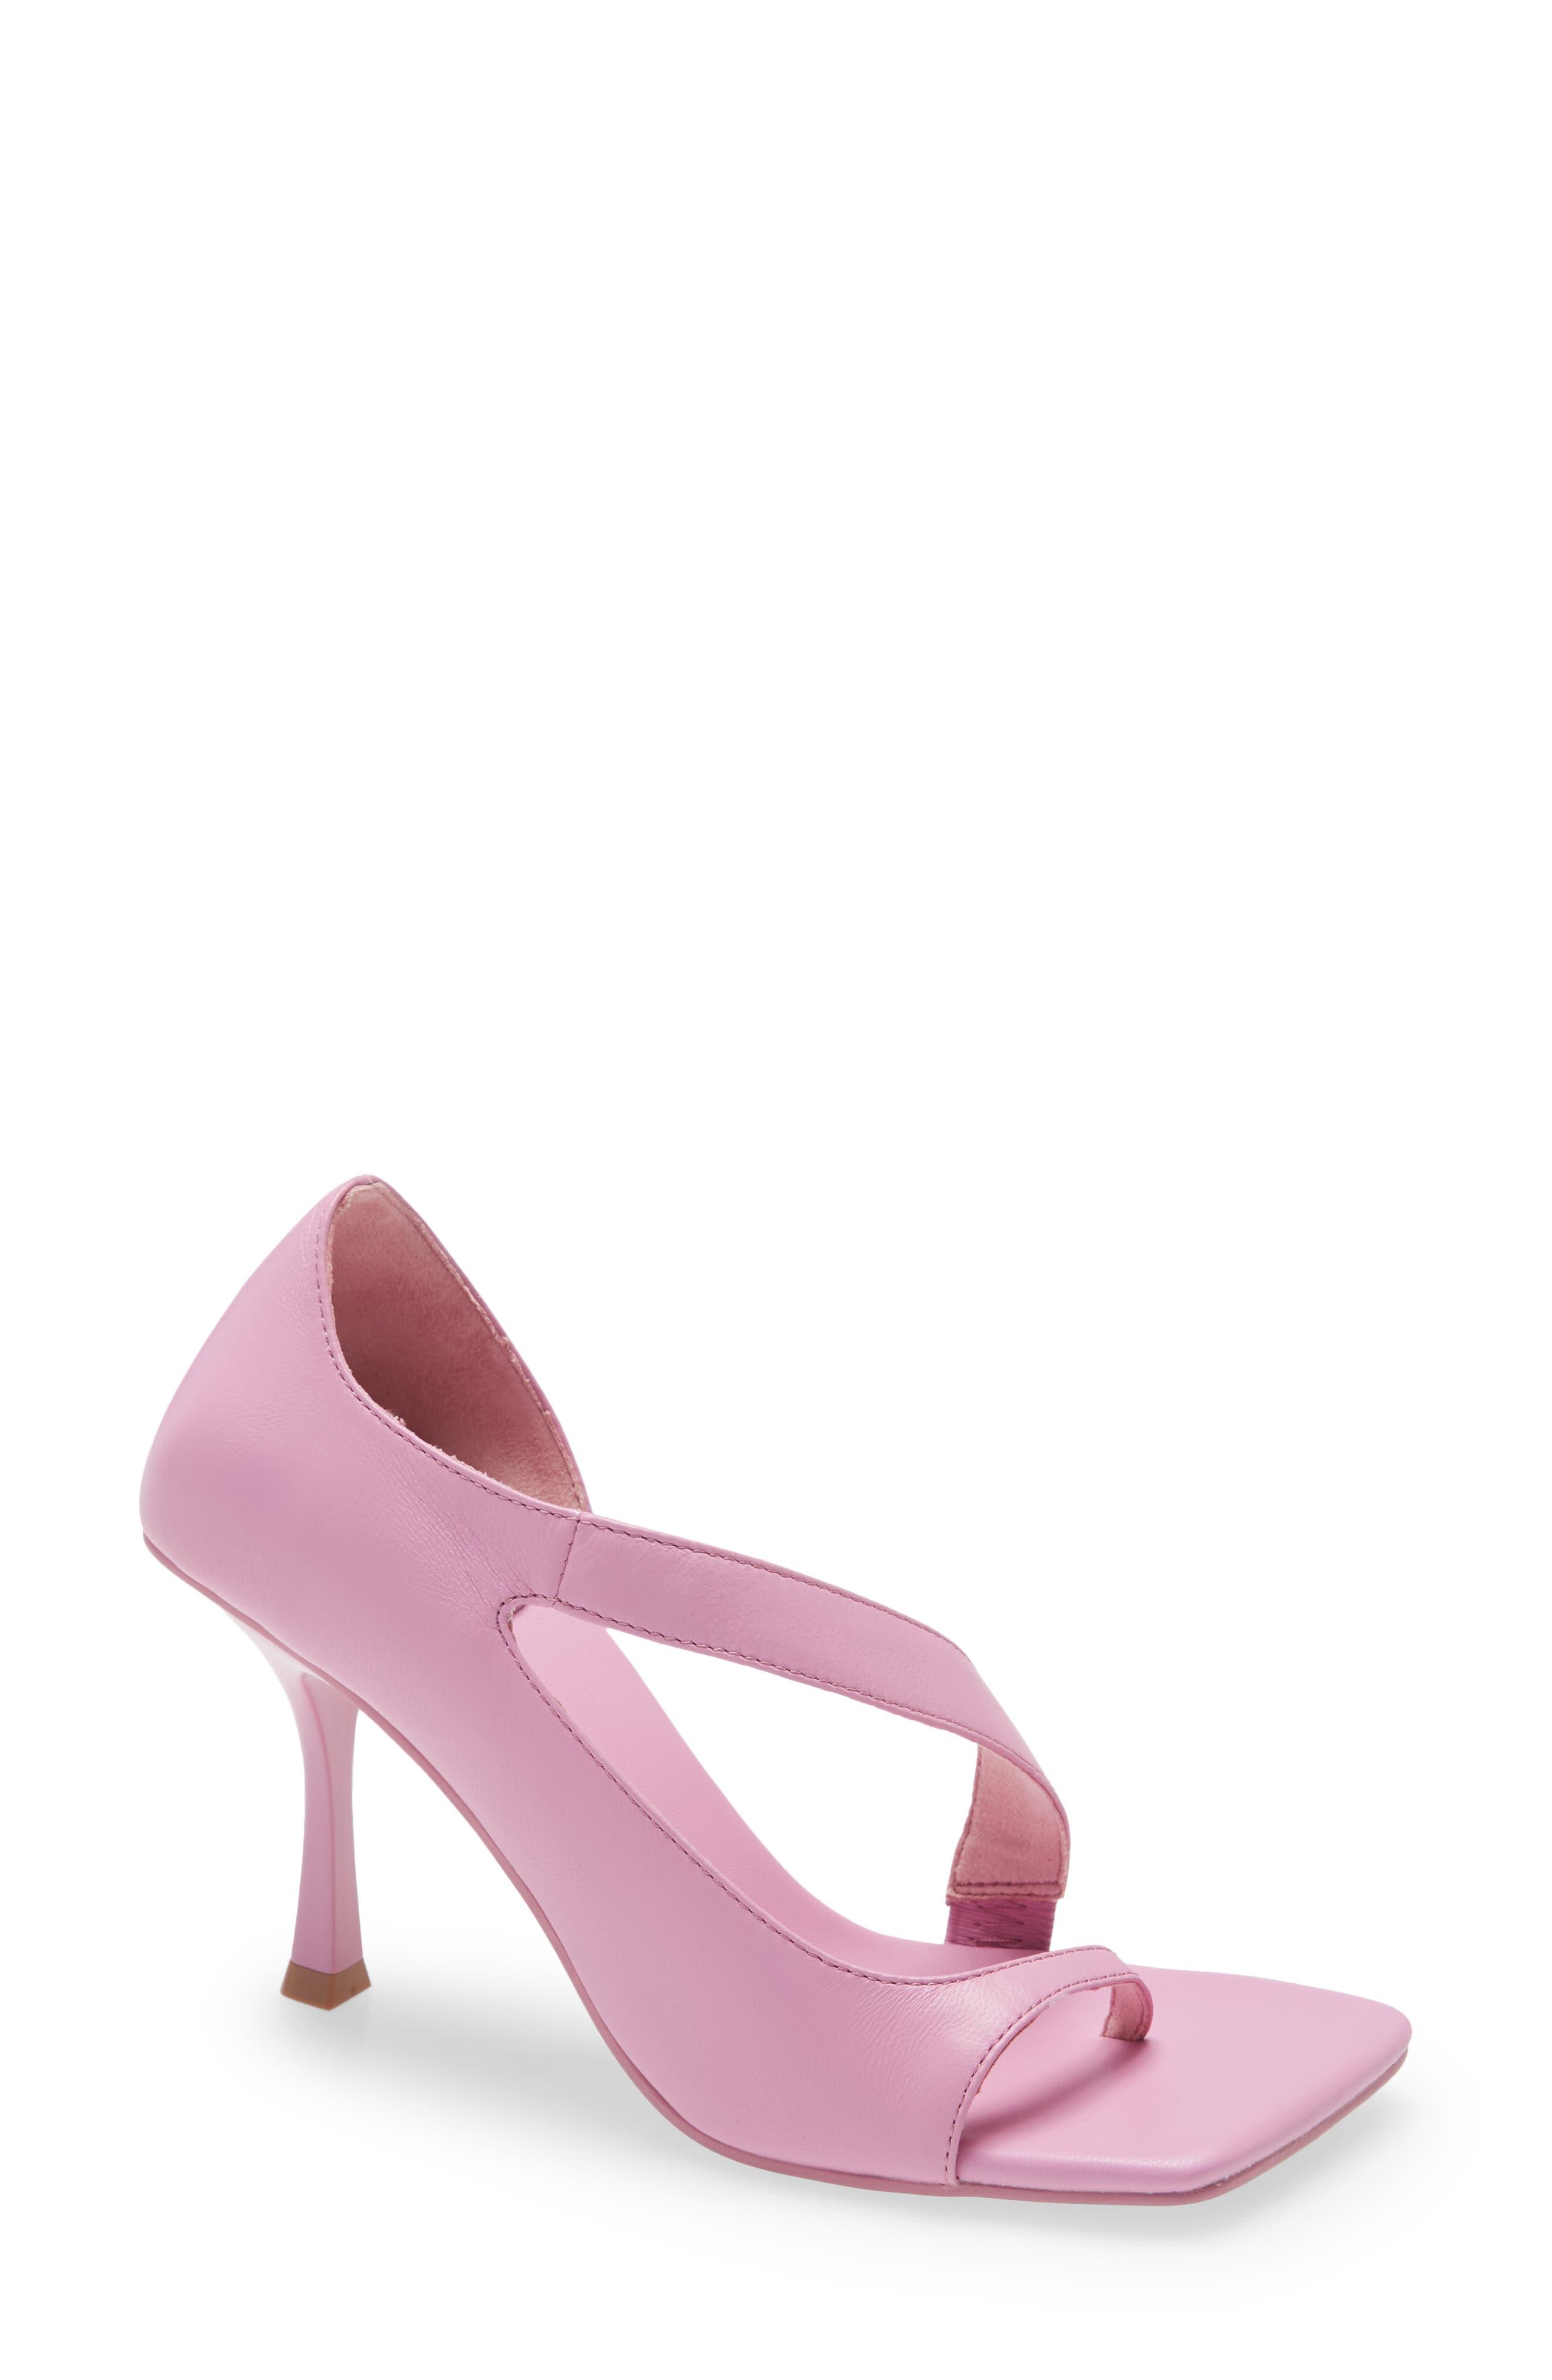 Berger Sandal